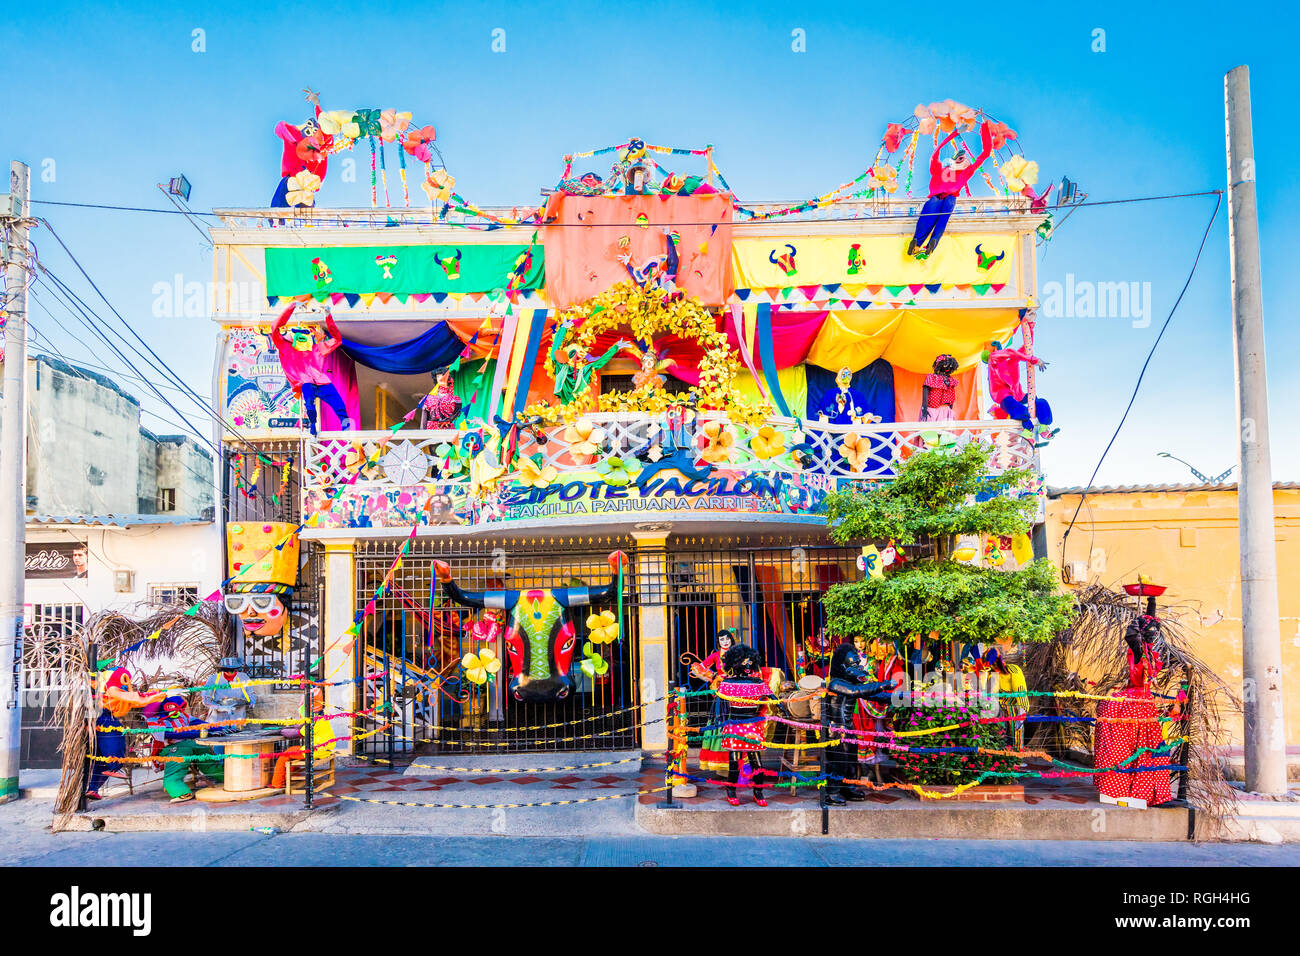 Barranquilla, Kolumbien - 24. Februar 2017: Haus dekoriert für den Karneval von Barranquilla Atlantico Kolumbien konzipiert Stockbild